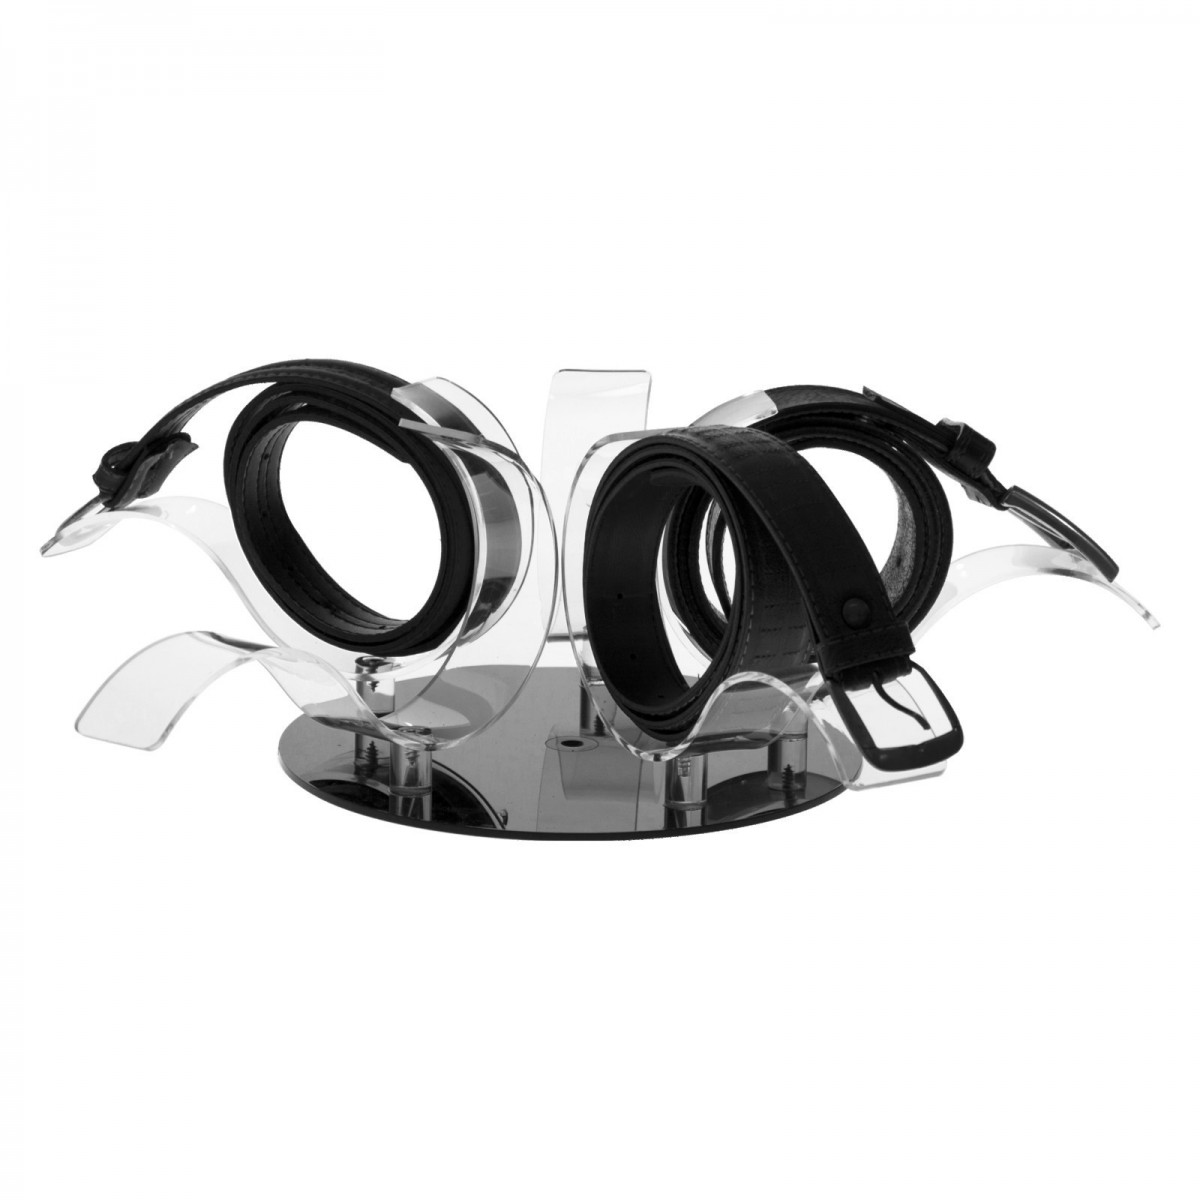 E-304 - Porta cintura in plexiglass trasparente